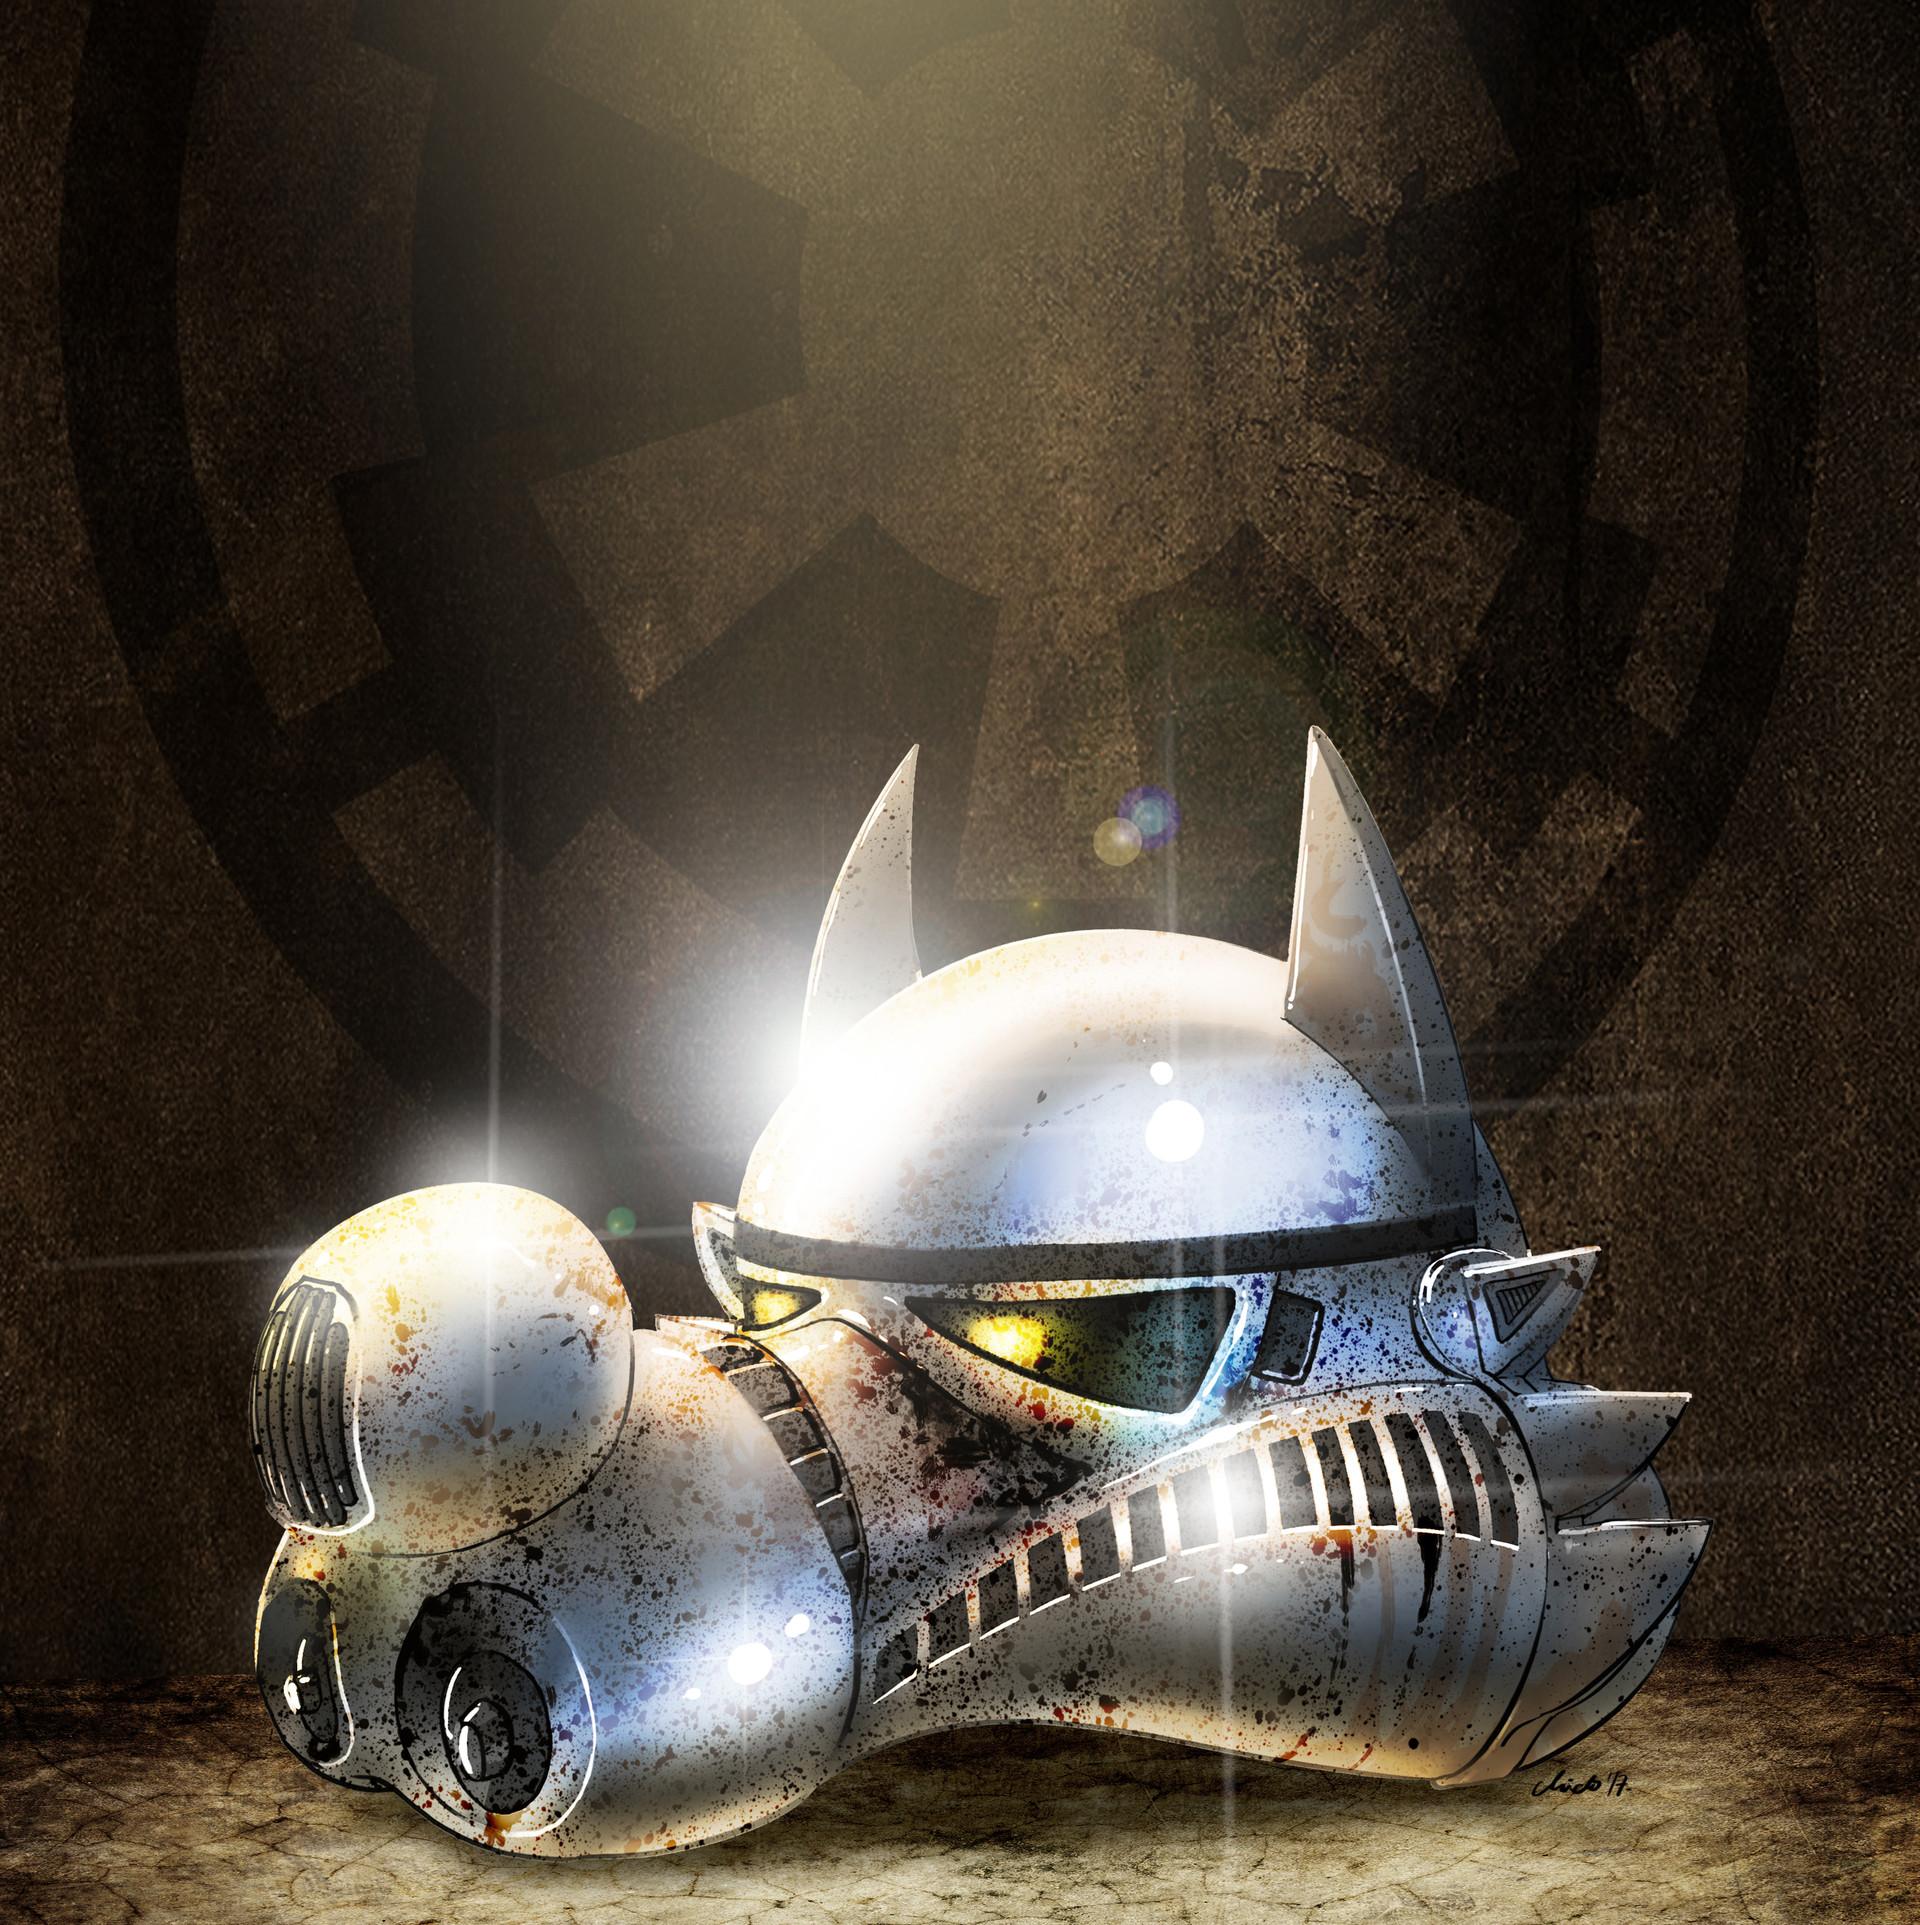 Midhat kapetanovic star wars vucko 02